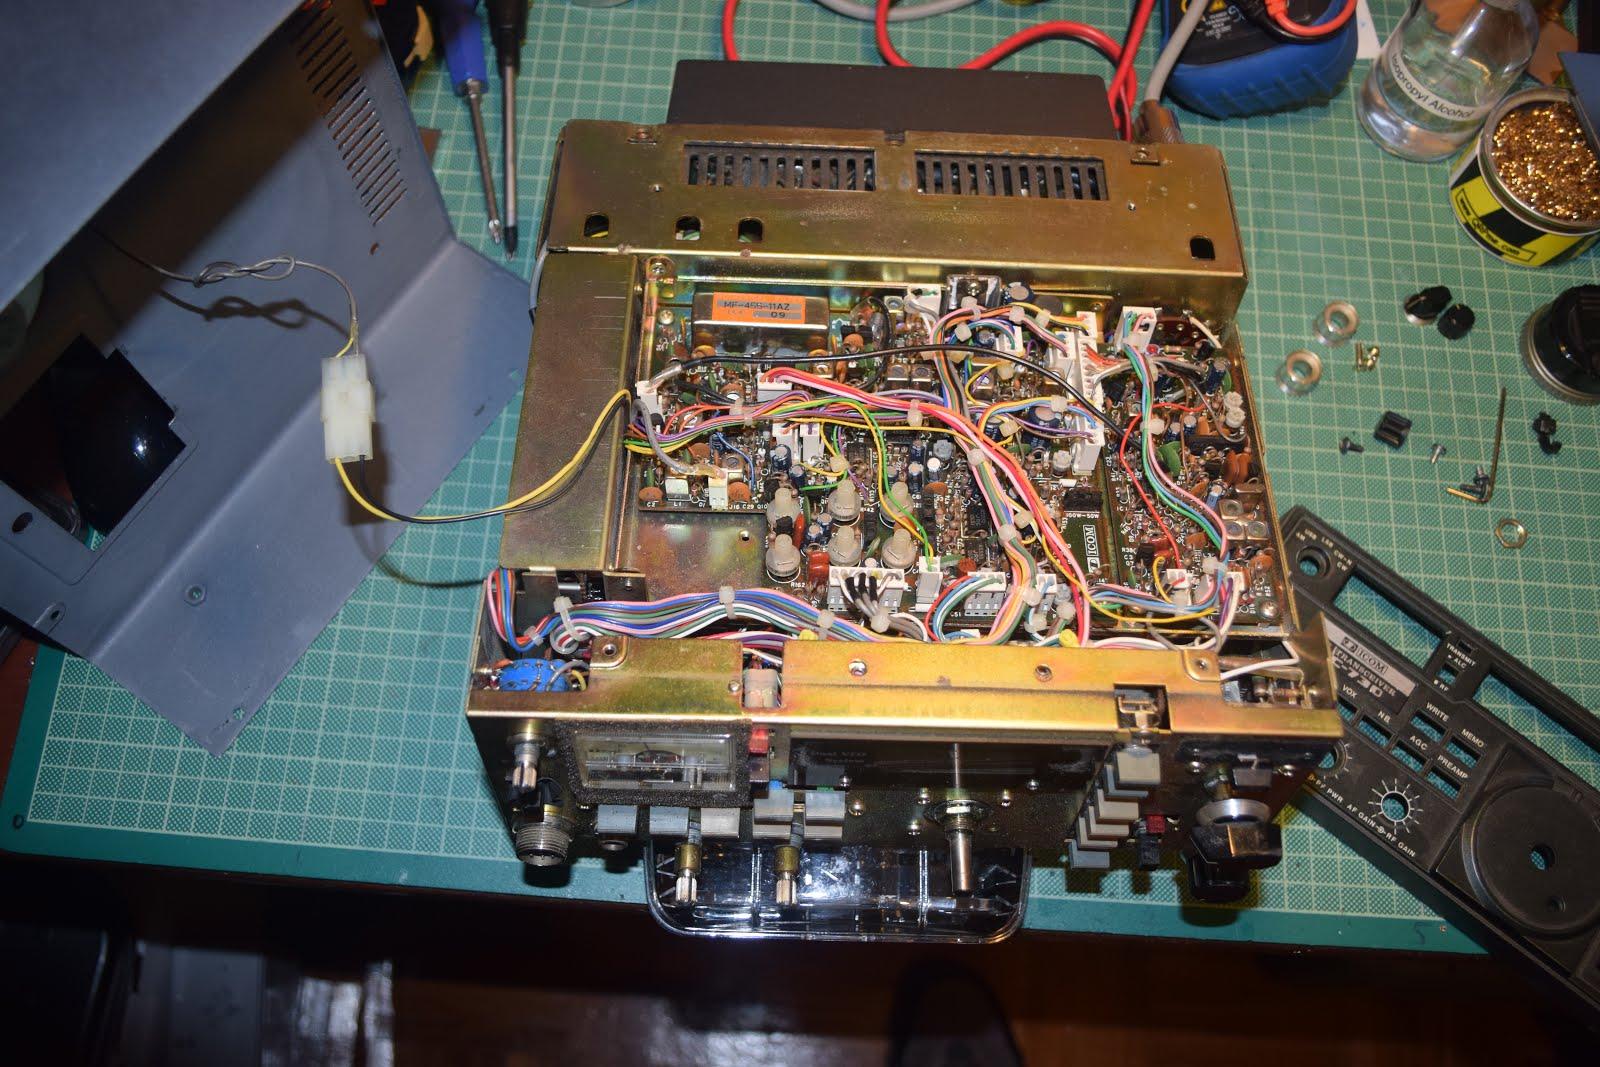 The ICOM IC-730 | HAMRADIOAL